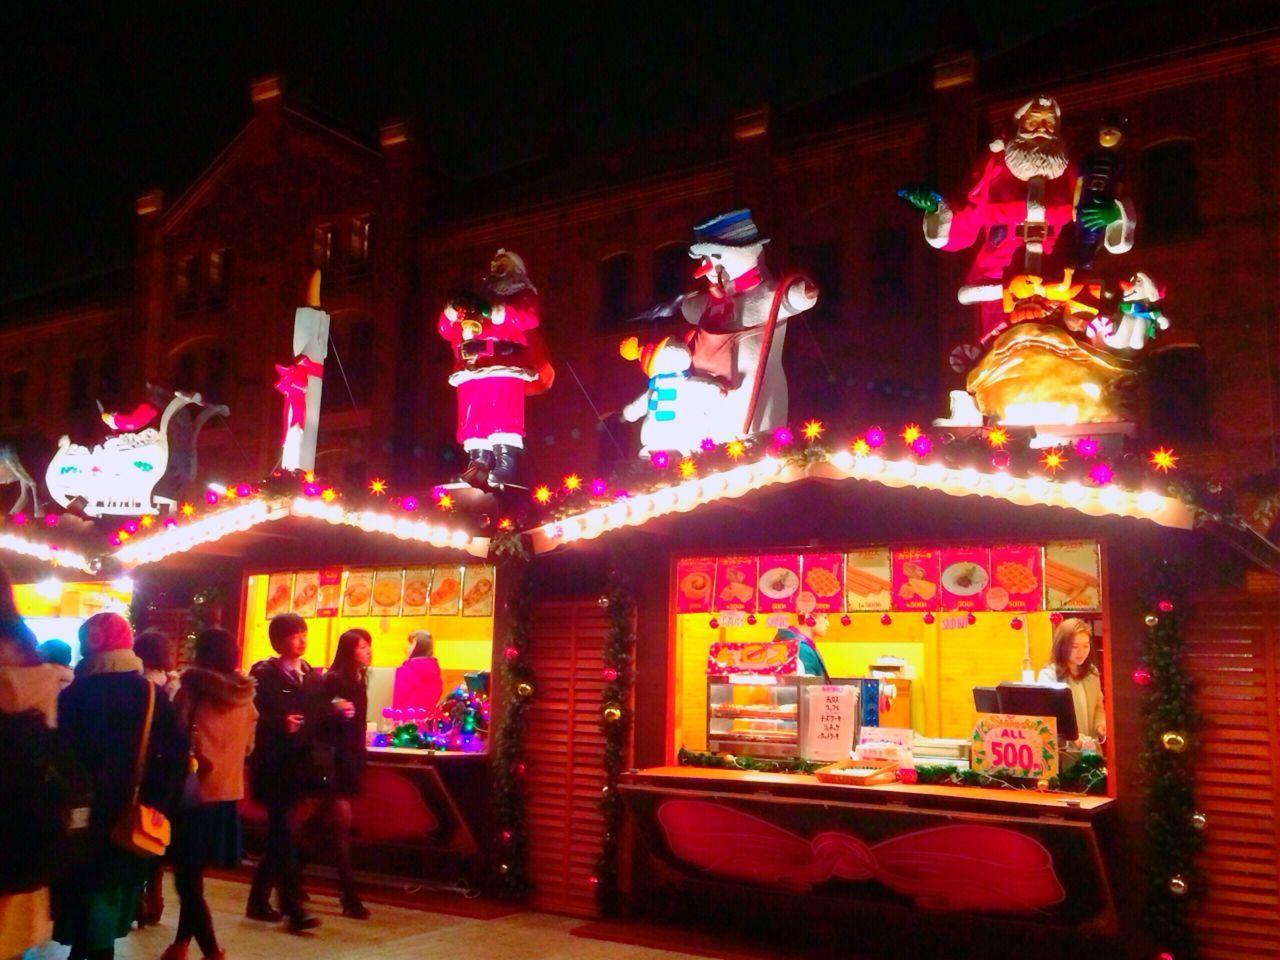 Illuminated Illumination Japanese  Japan Night Beautiful Good Times Picture Chirstmasmarket Chirstmas 2015  EyeEm Gallery Eyeem Market